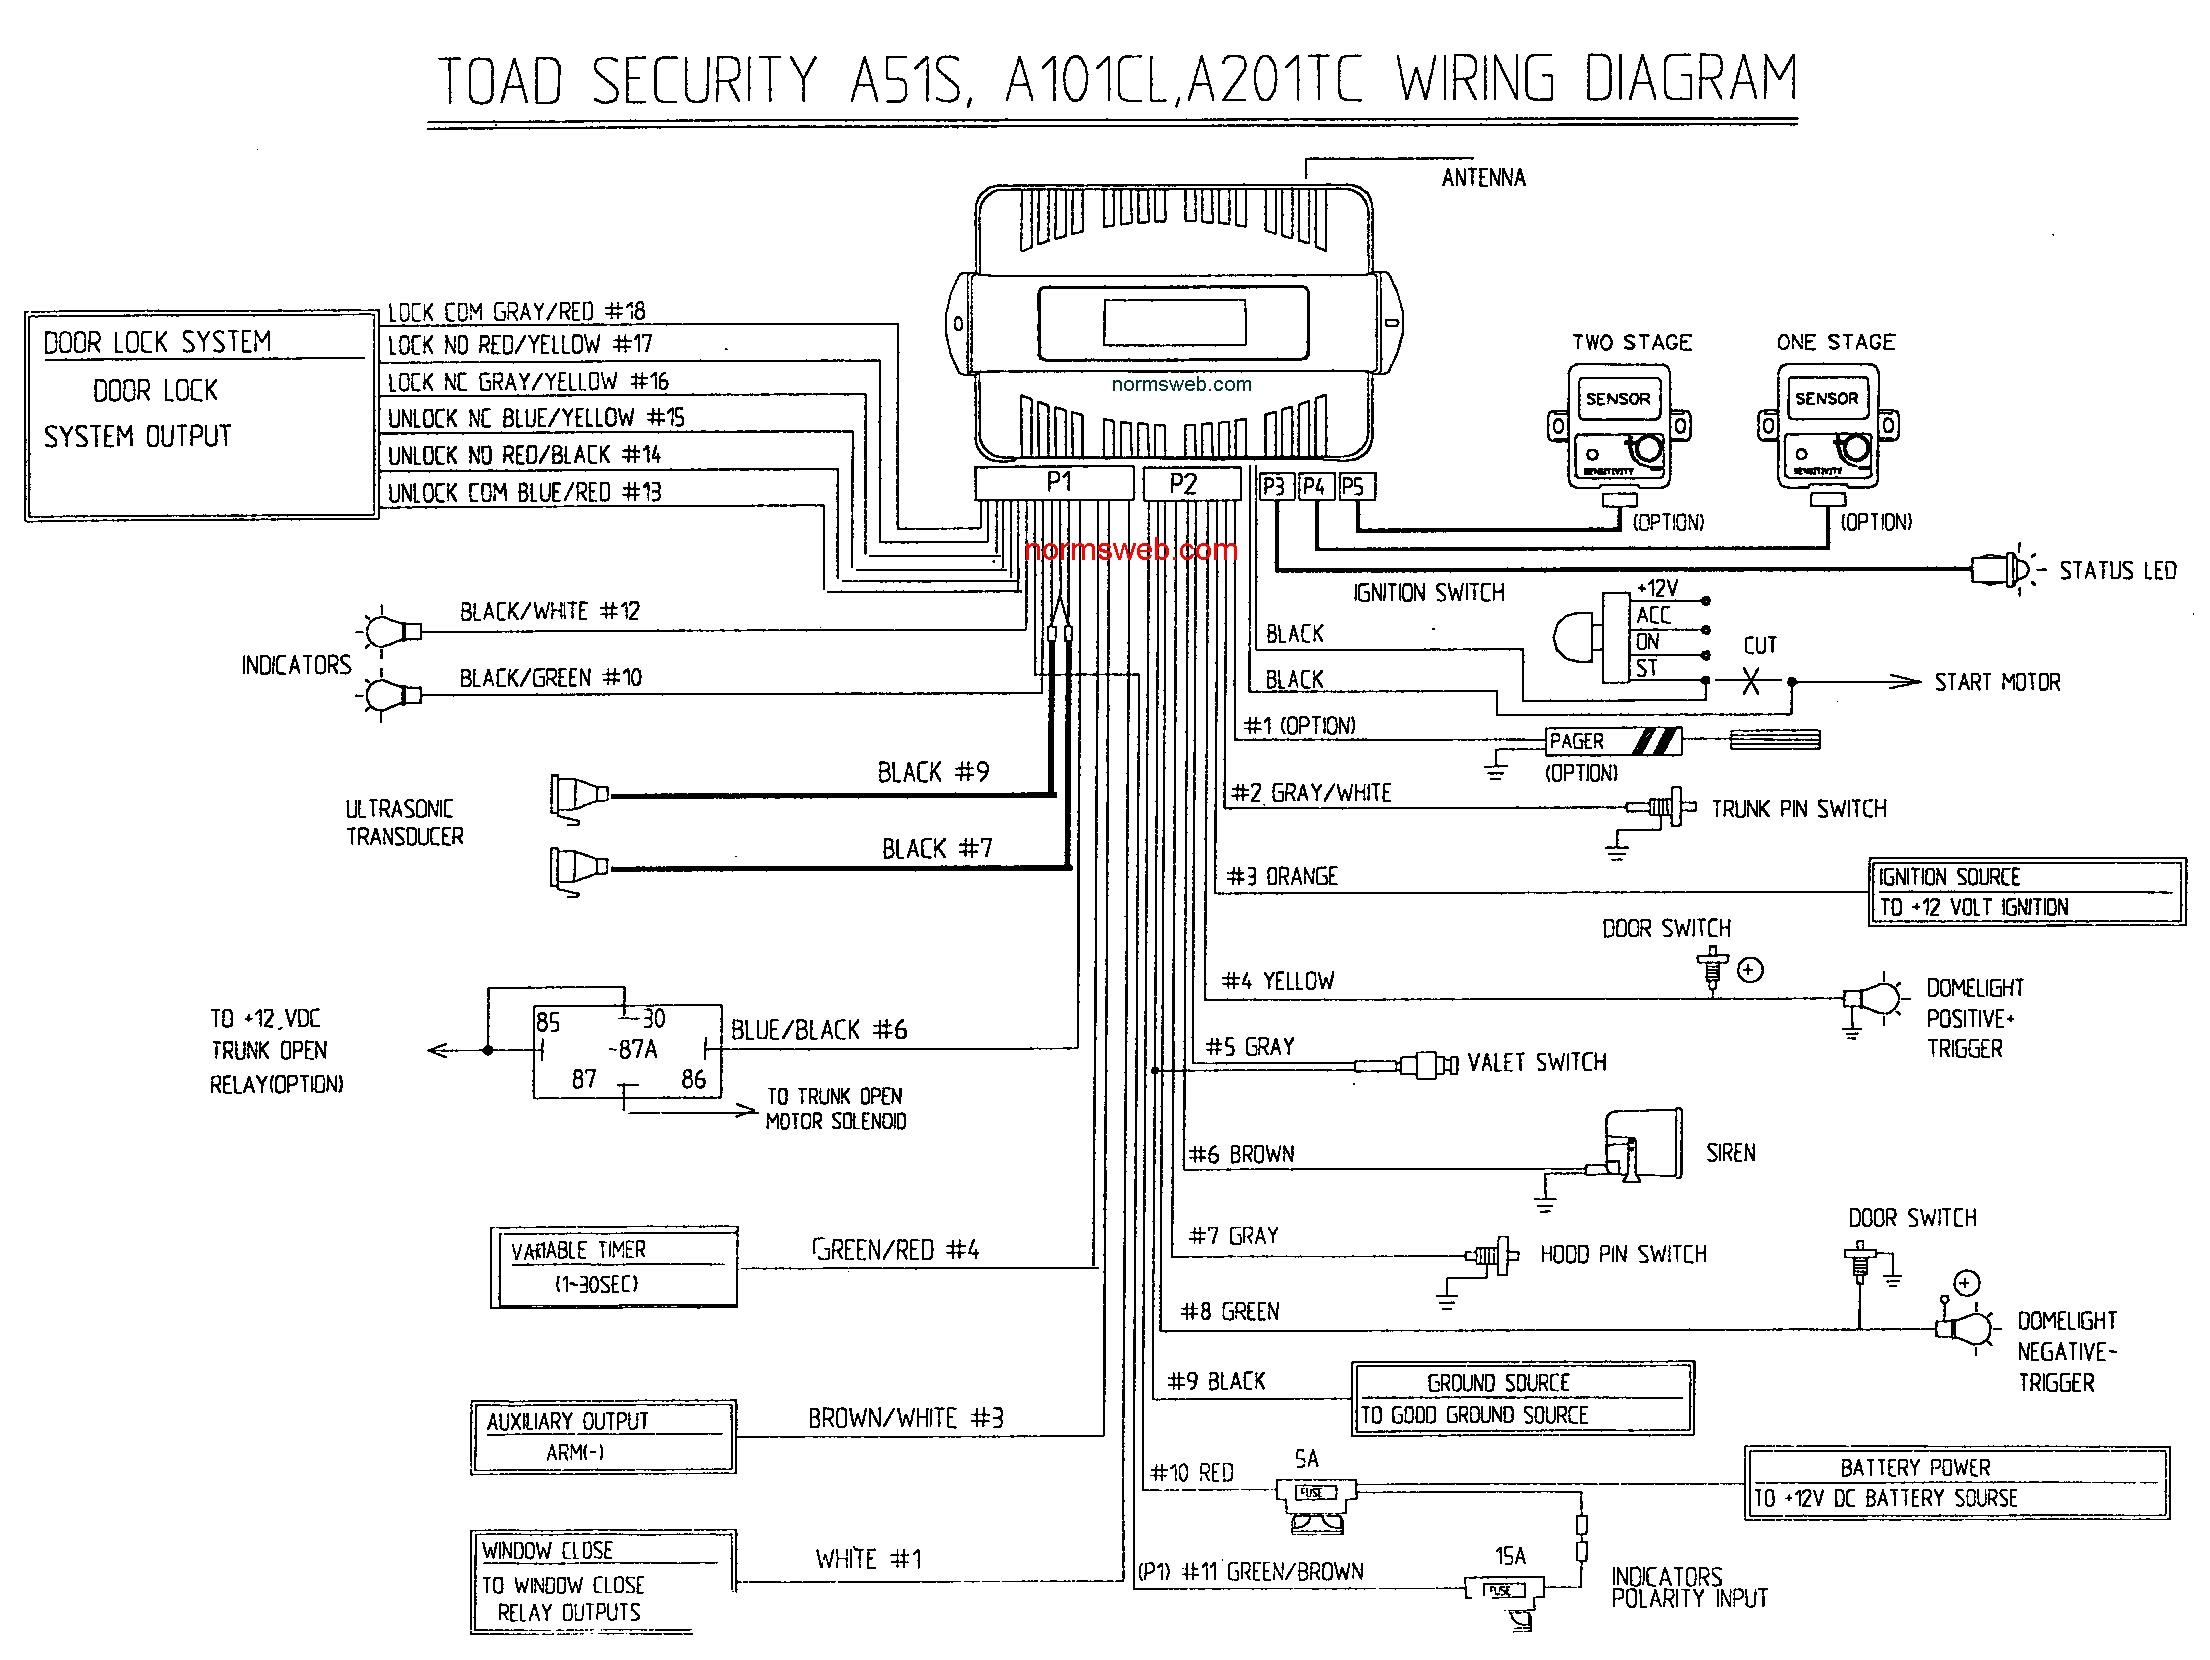 Bulldog Security Bd New Vehicle Wiring Diagrams Wiring Diagram Bulldog Security Diagrams to A Single Wiring Diagram